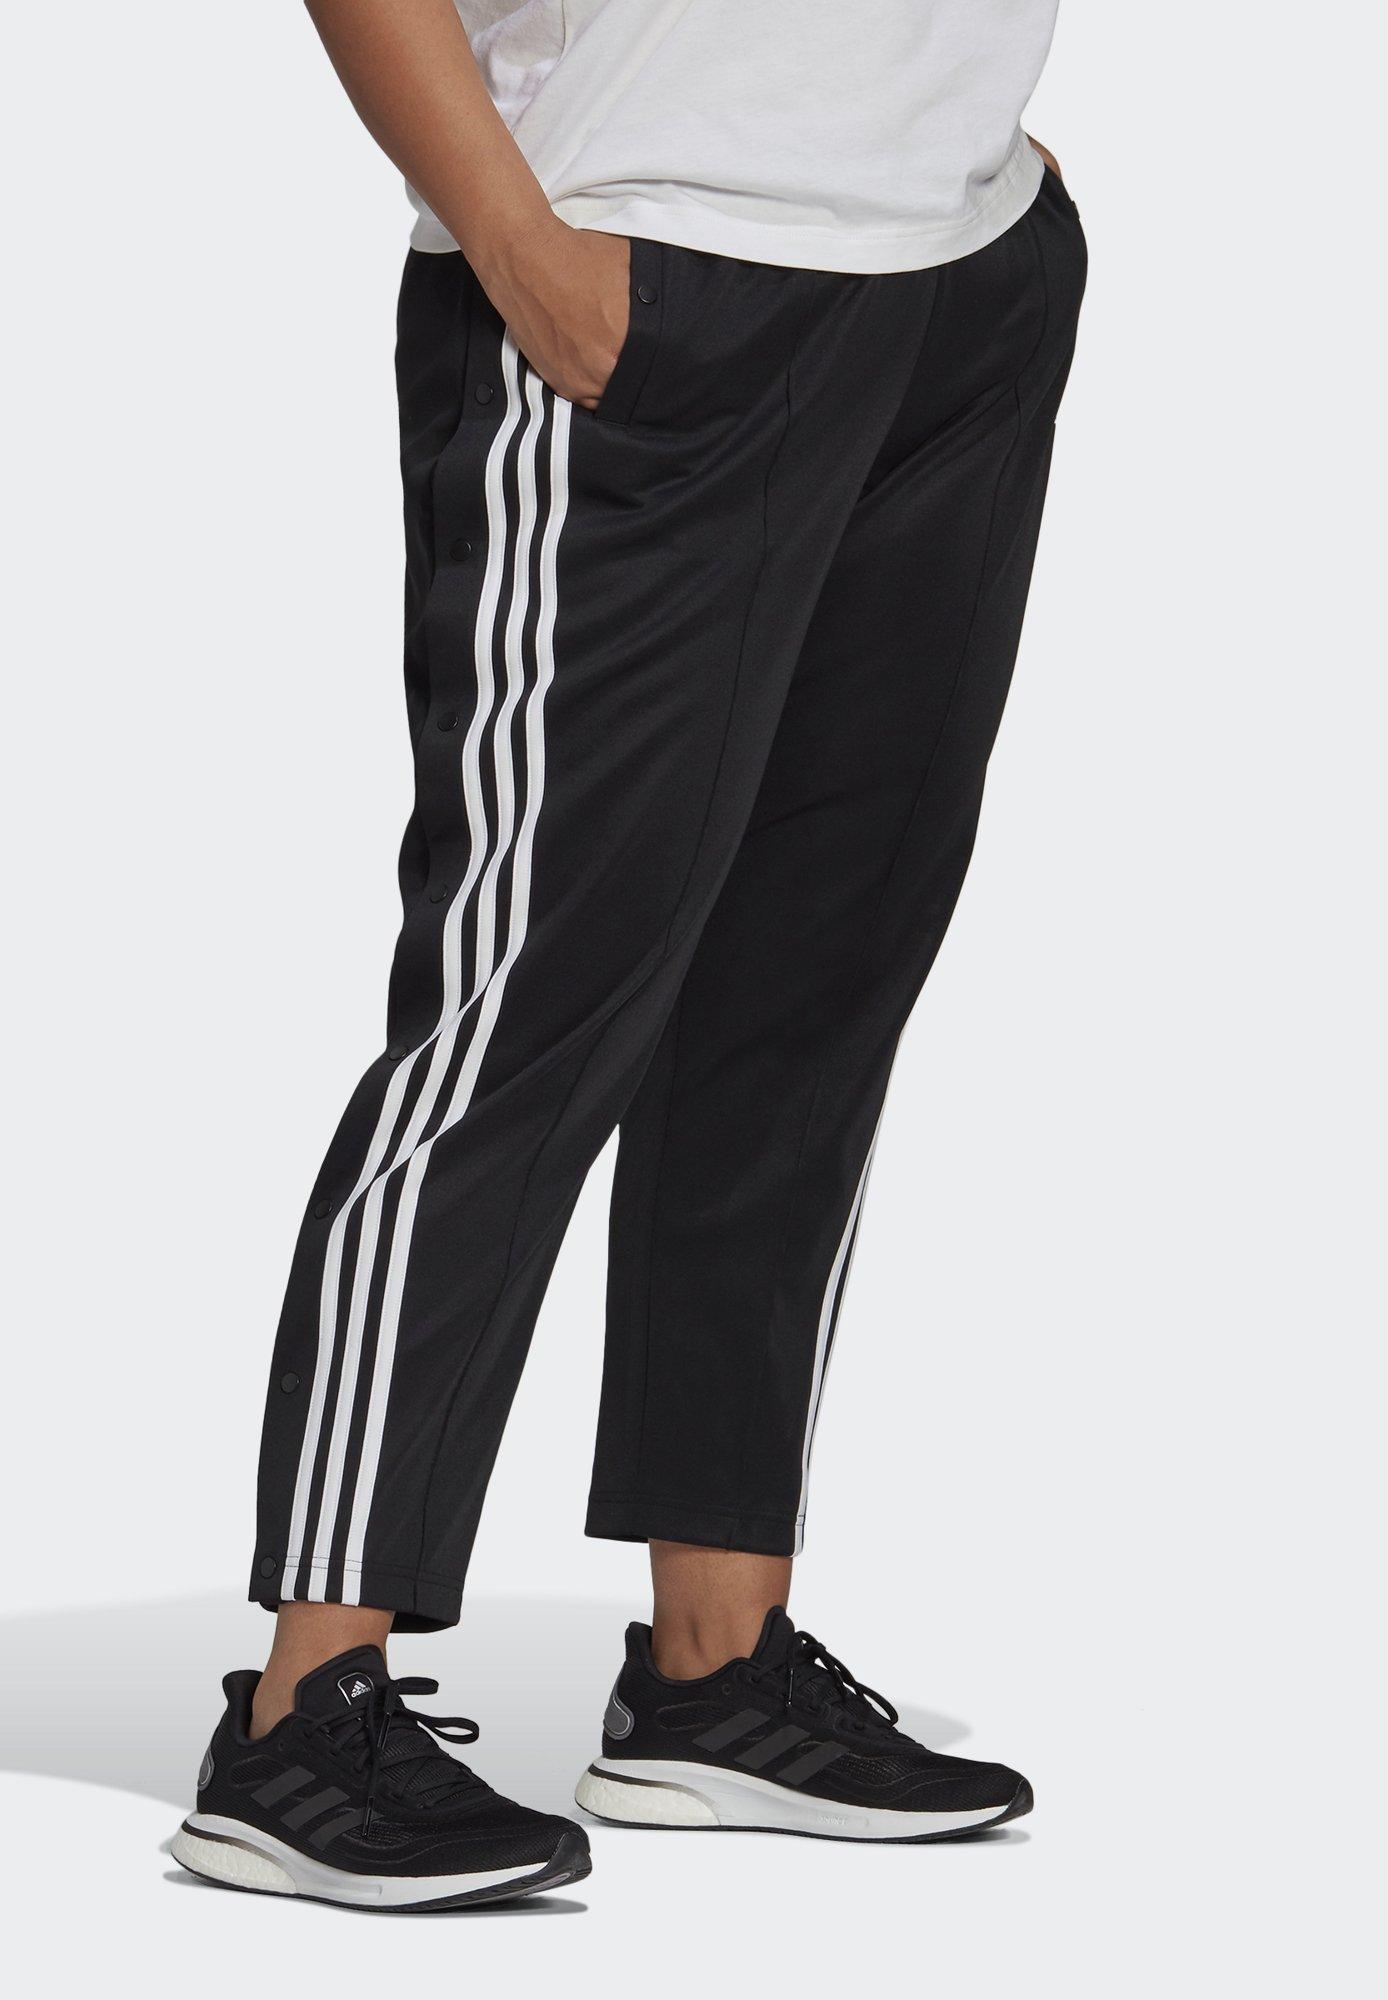 Femme ADIDAS SPORTSWEAR WRAPPED 3-STRIPES SNAP PANTS (PLUS SIZE) - Pantalon de survêtement